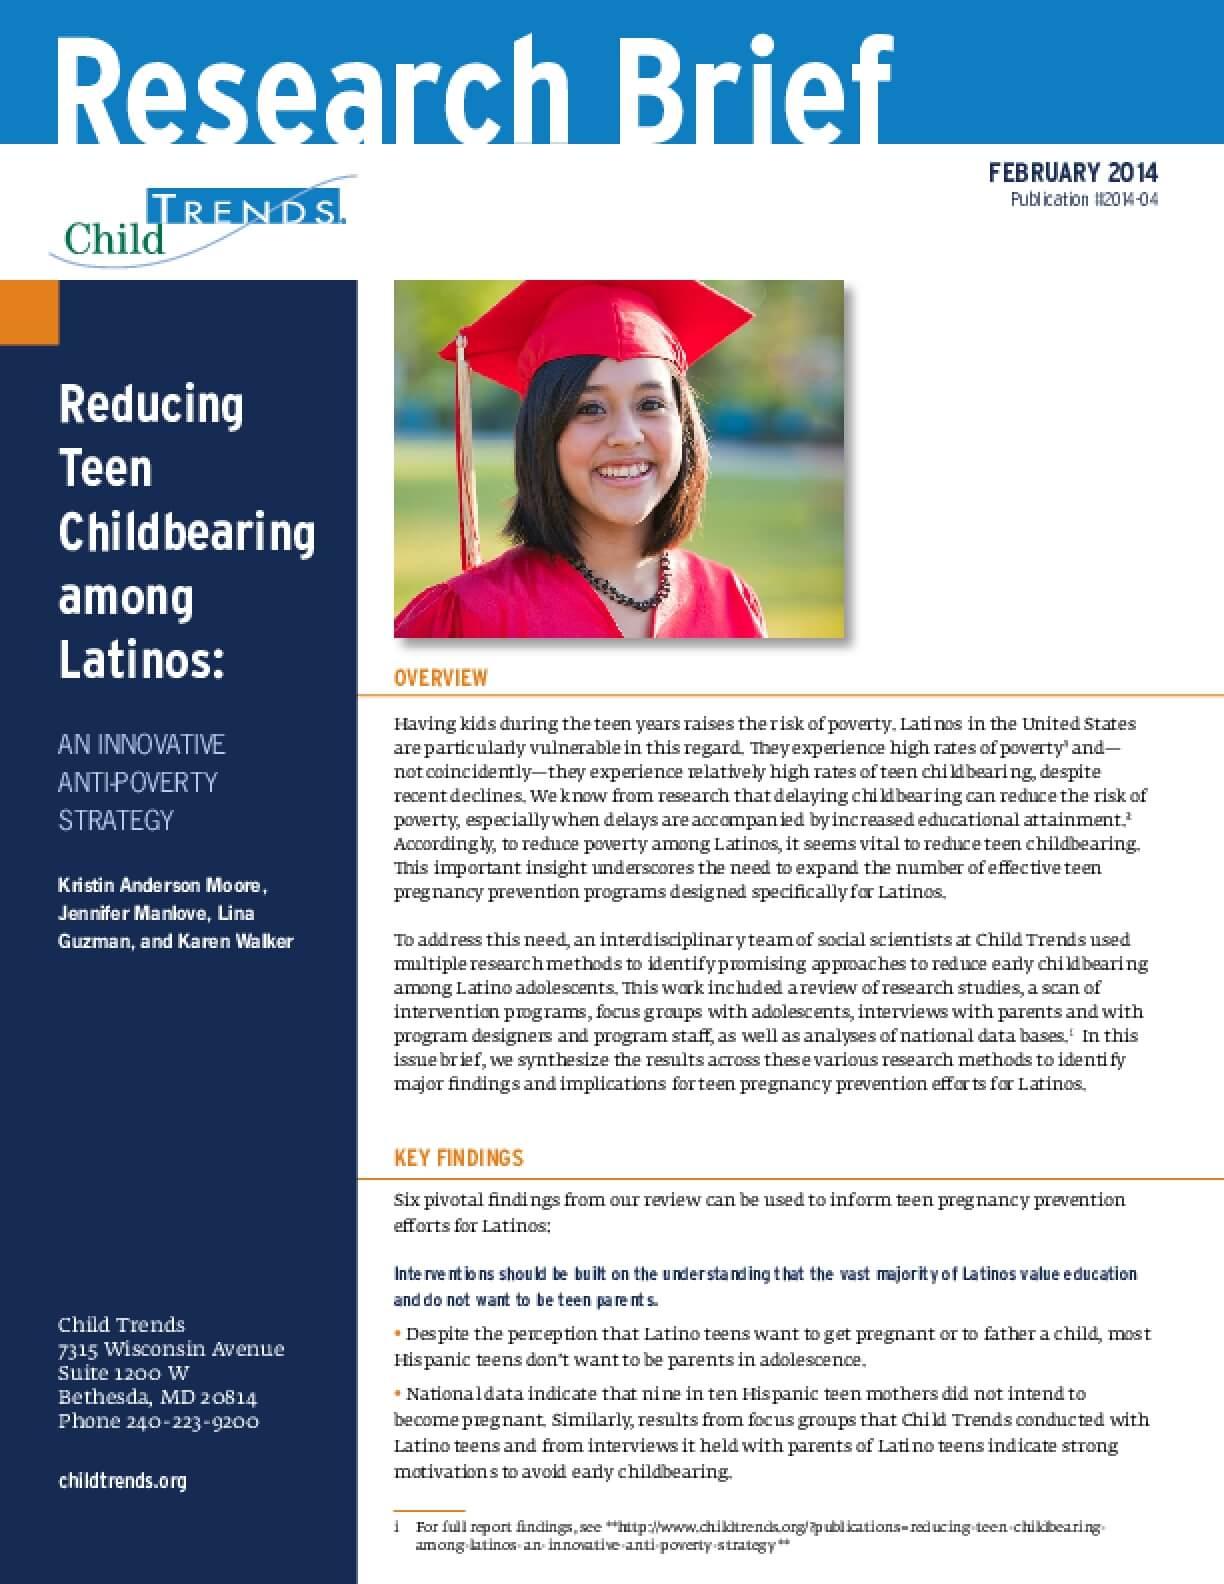 Reducing Teen Childbearing Among Latinos: An Innovative Anti-Poverty Strategy